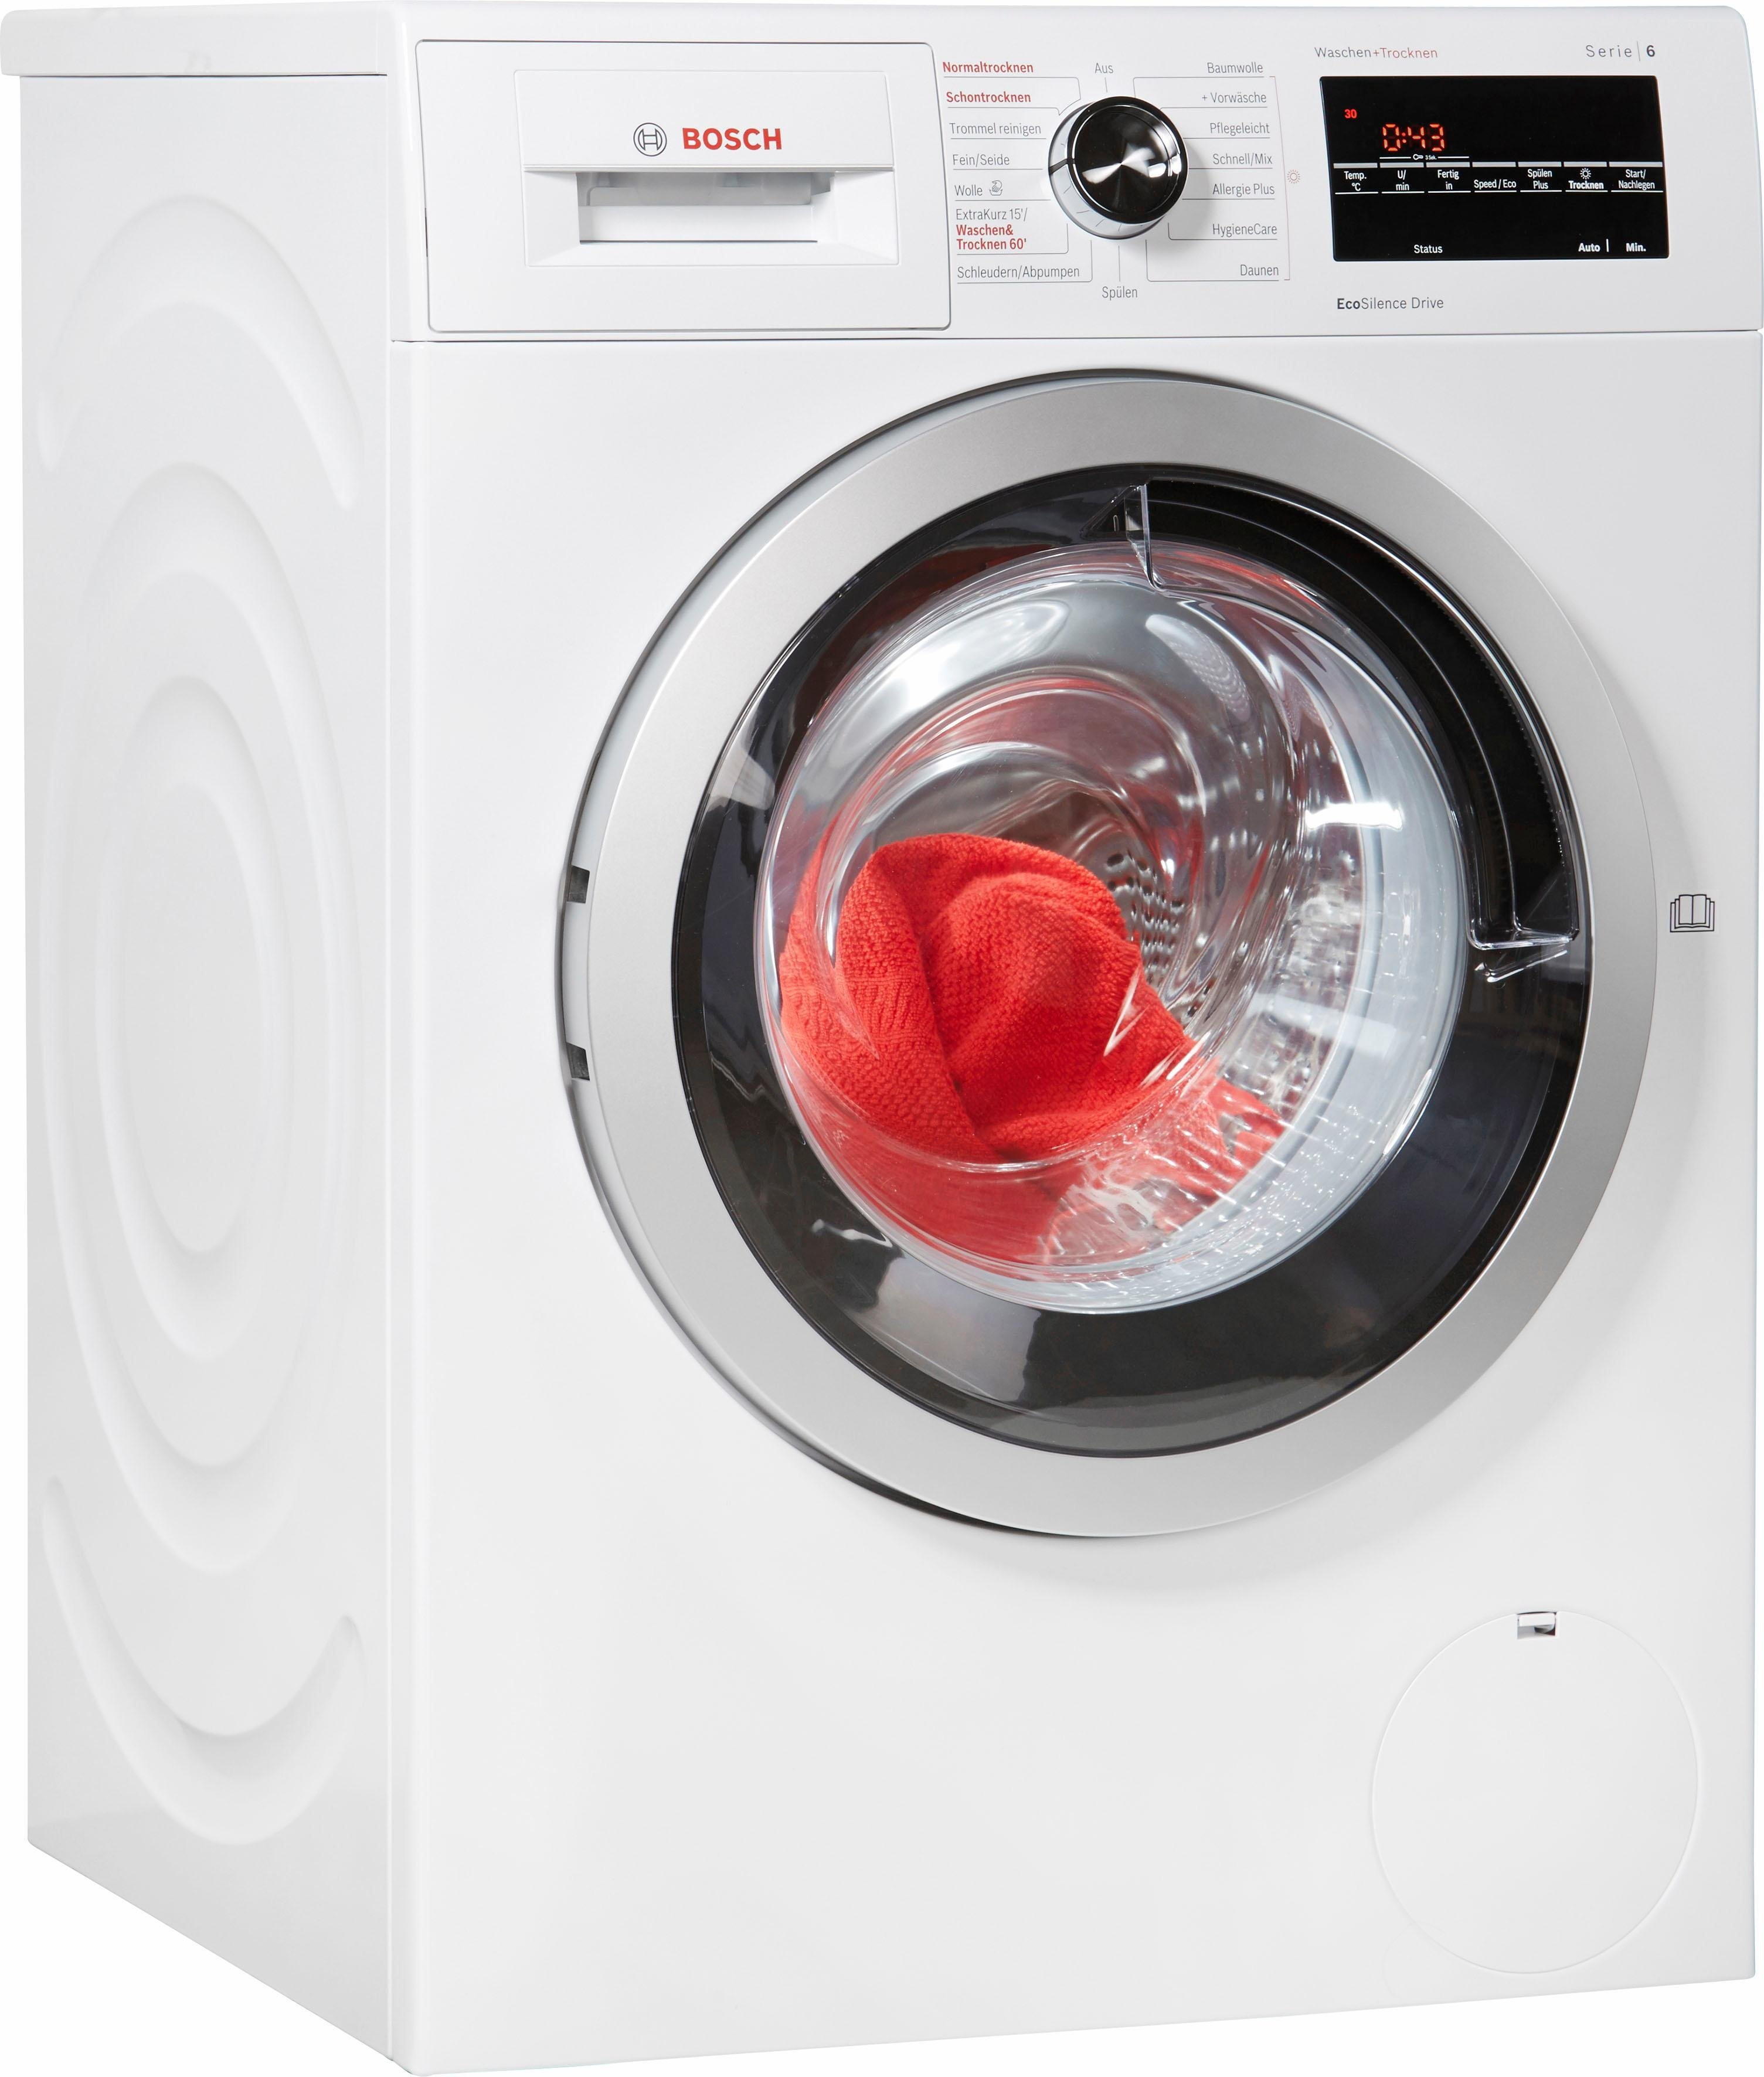 BOSCH Waschtrockner WVG30443, A, 7 kg / 4 kg, 1.500 U/Min